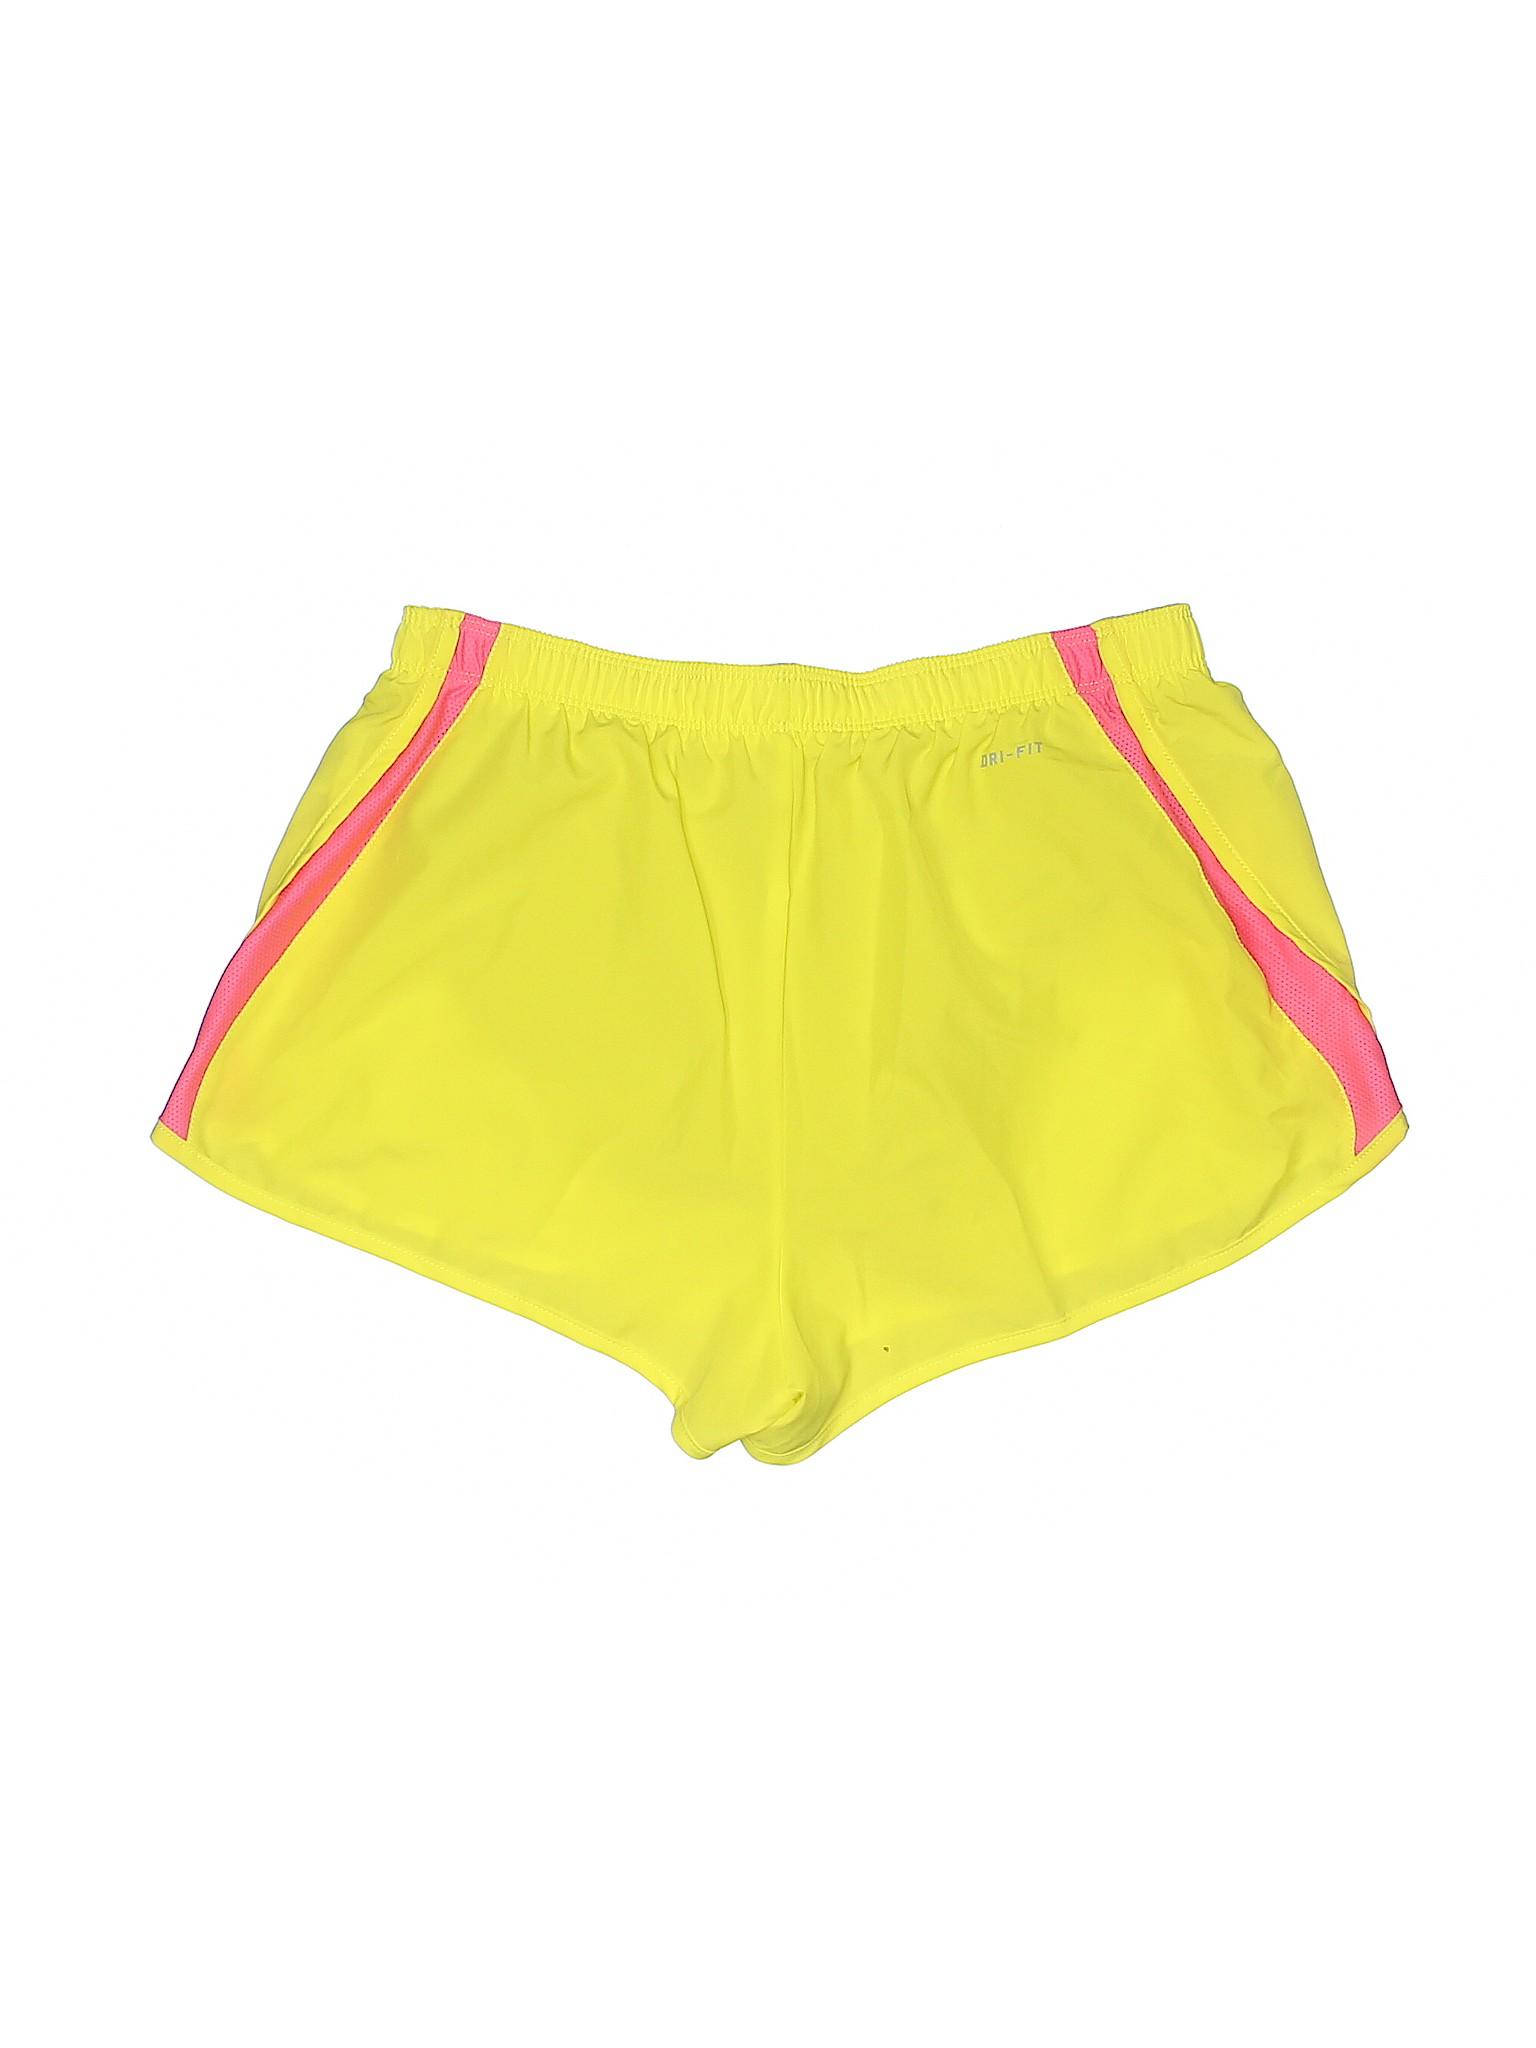 Nike Nike Shorts Boutique Athletic Boutique Shorts Boutique Athletic Athletic Nike 74xqwFOn